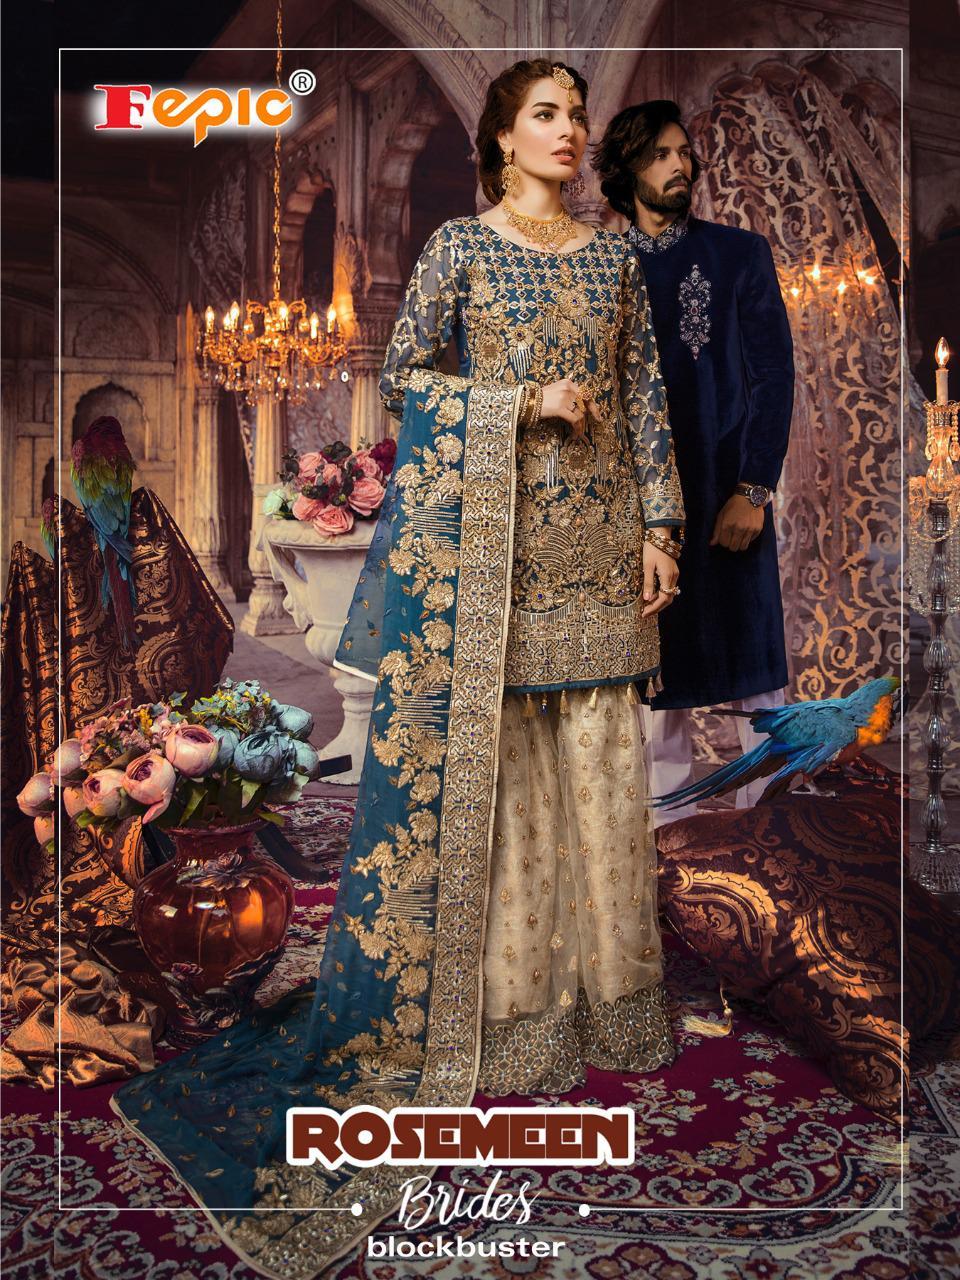 Fepic Rosemeen Brides Blockbuster Designer Heavy Georgette Partywear Pakistani Pettern Suits Wholesale